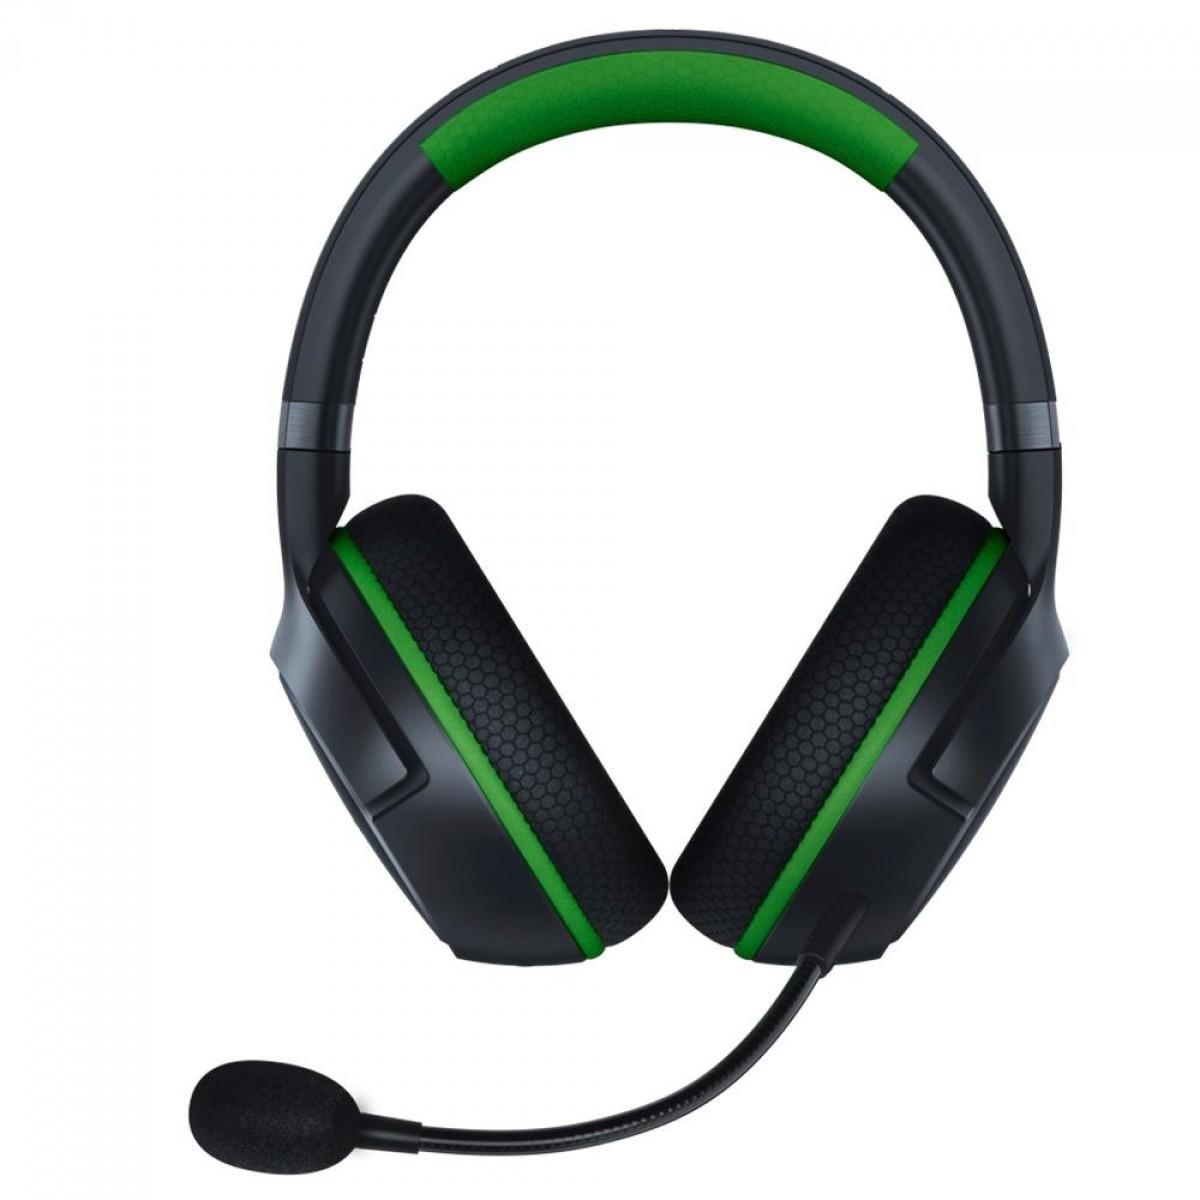 Headset Gamer Razer Kaira Pro, Bluetooth, Xbox, Black/Green, RZ04-03470100-R3U1